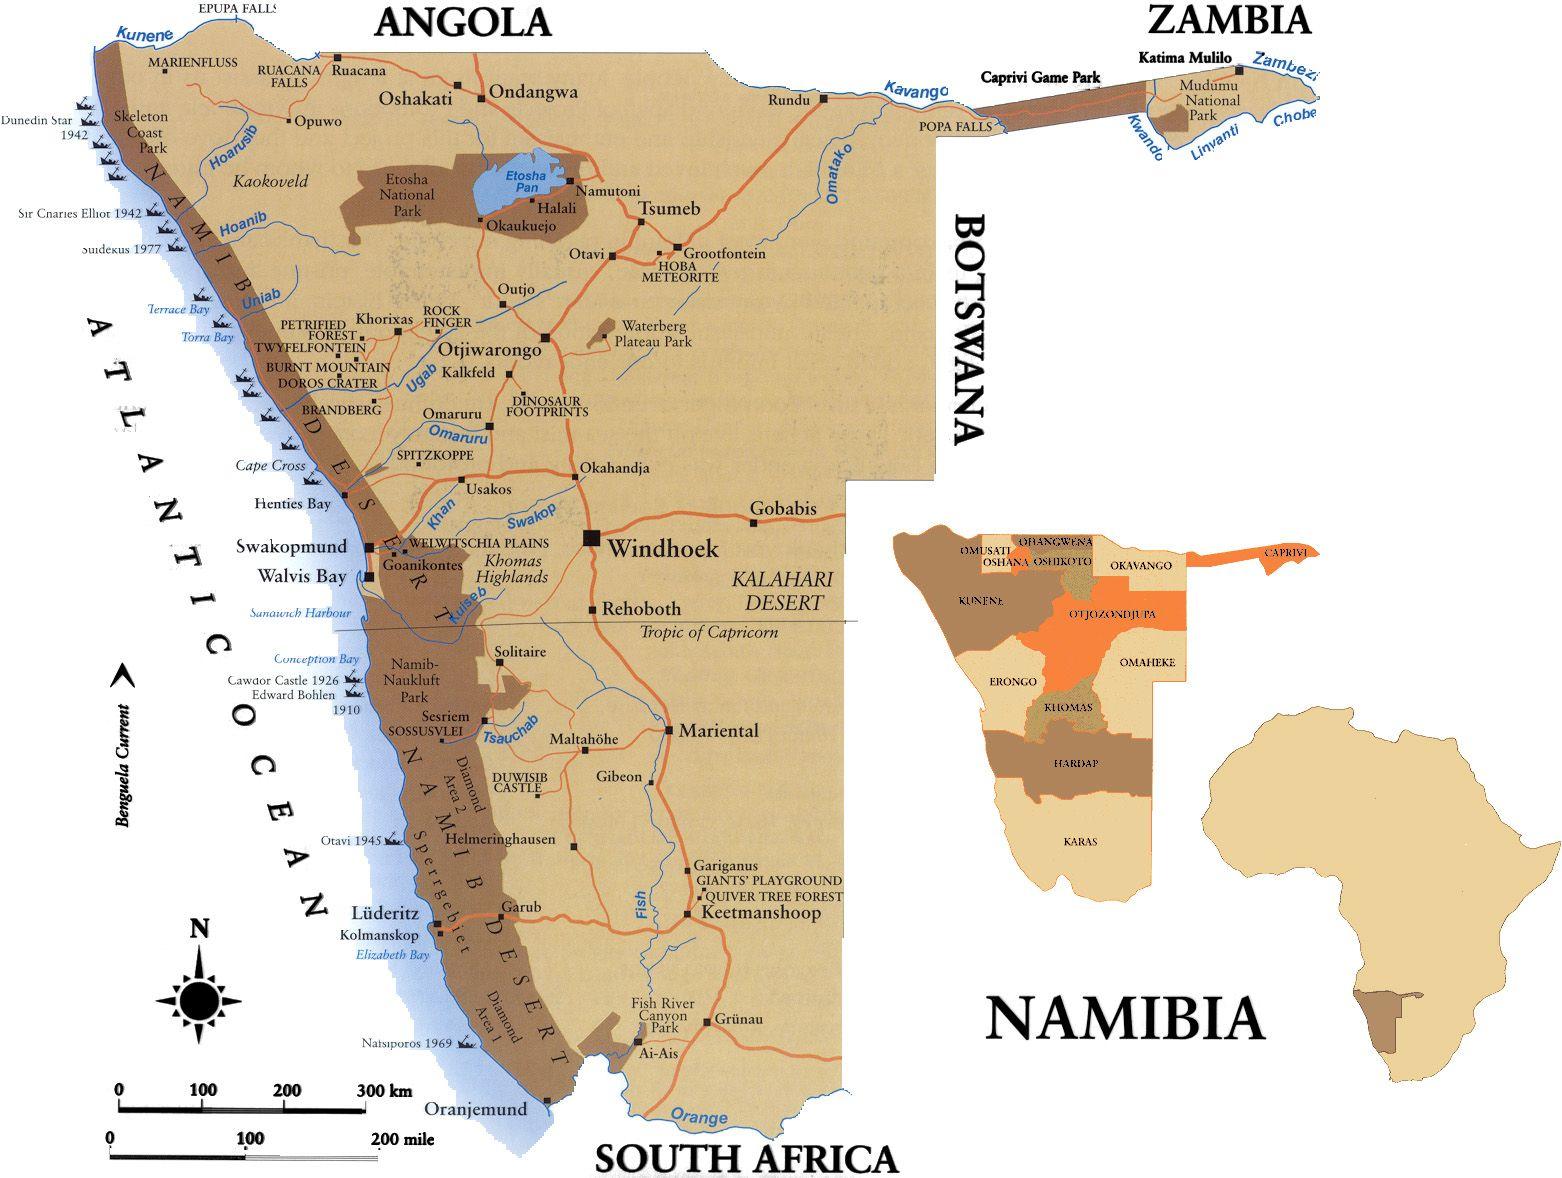 Map Of Africa Kalahari Desert.New Flat In Windhoek Namibia In Between Namib And Kalahari Deserts